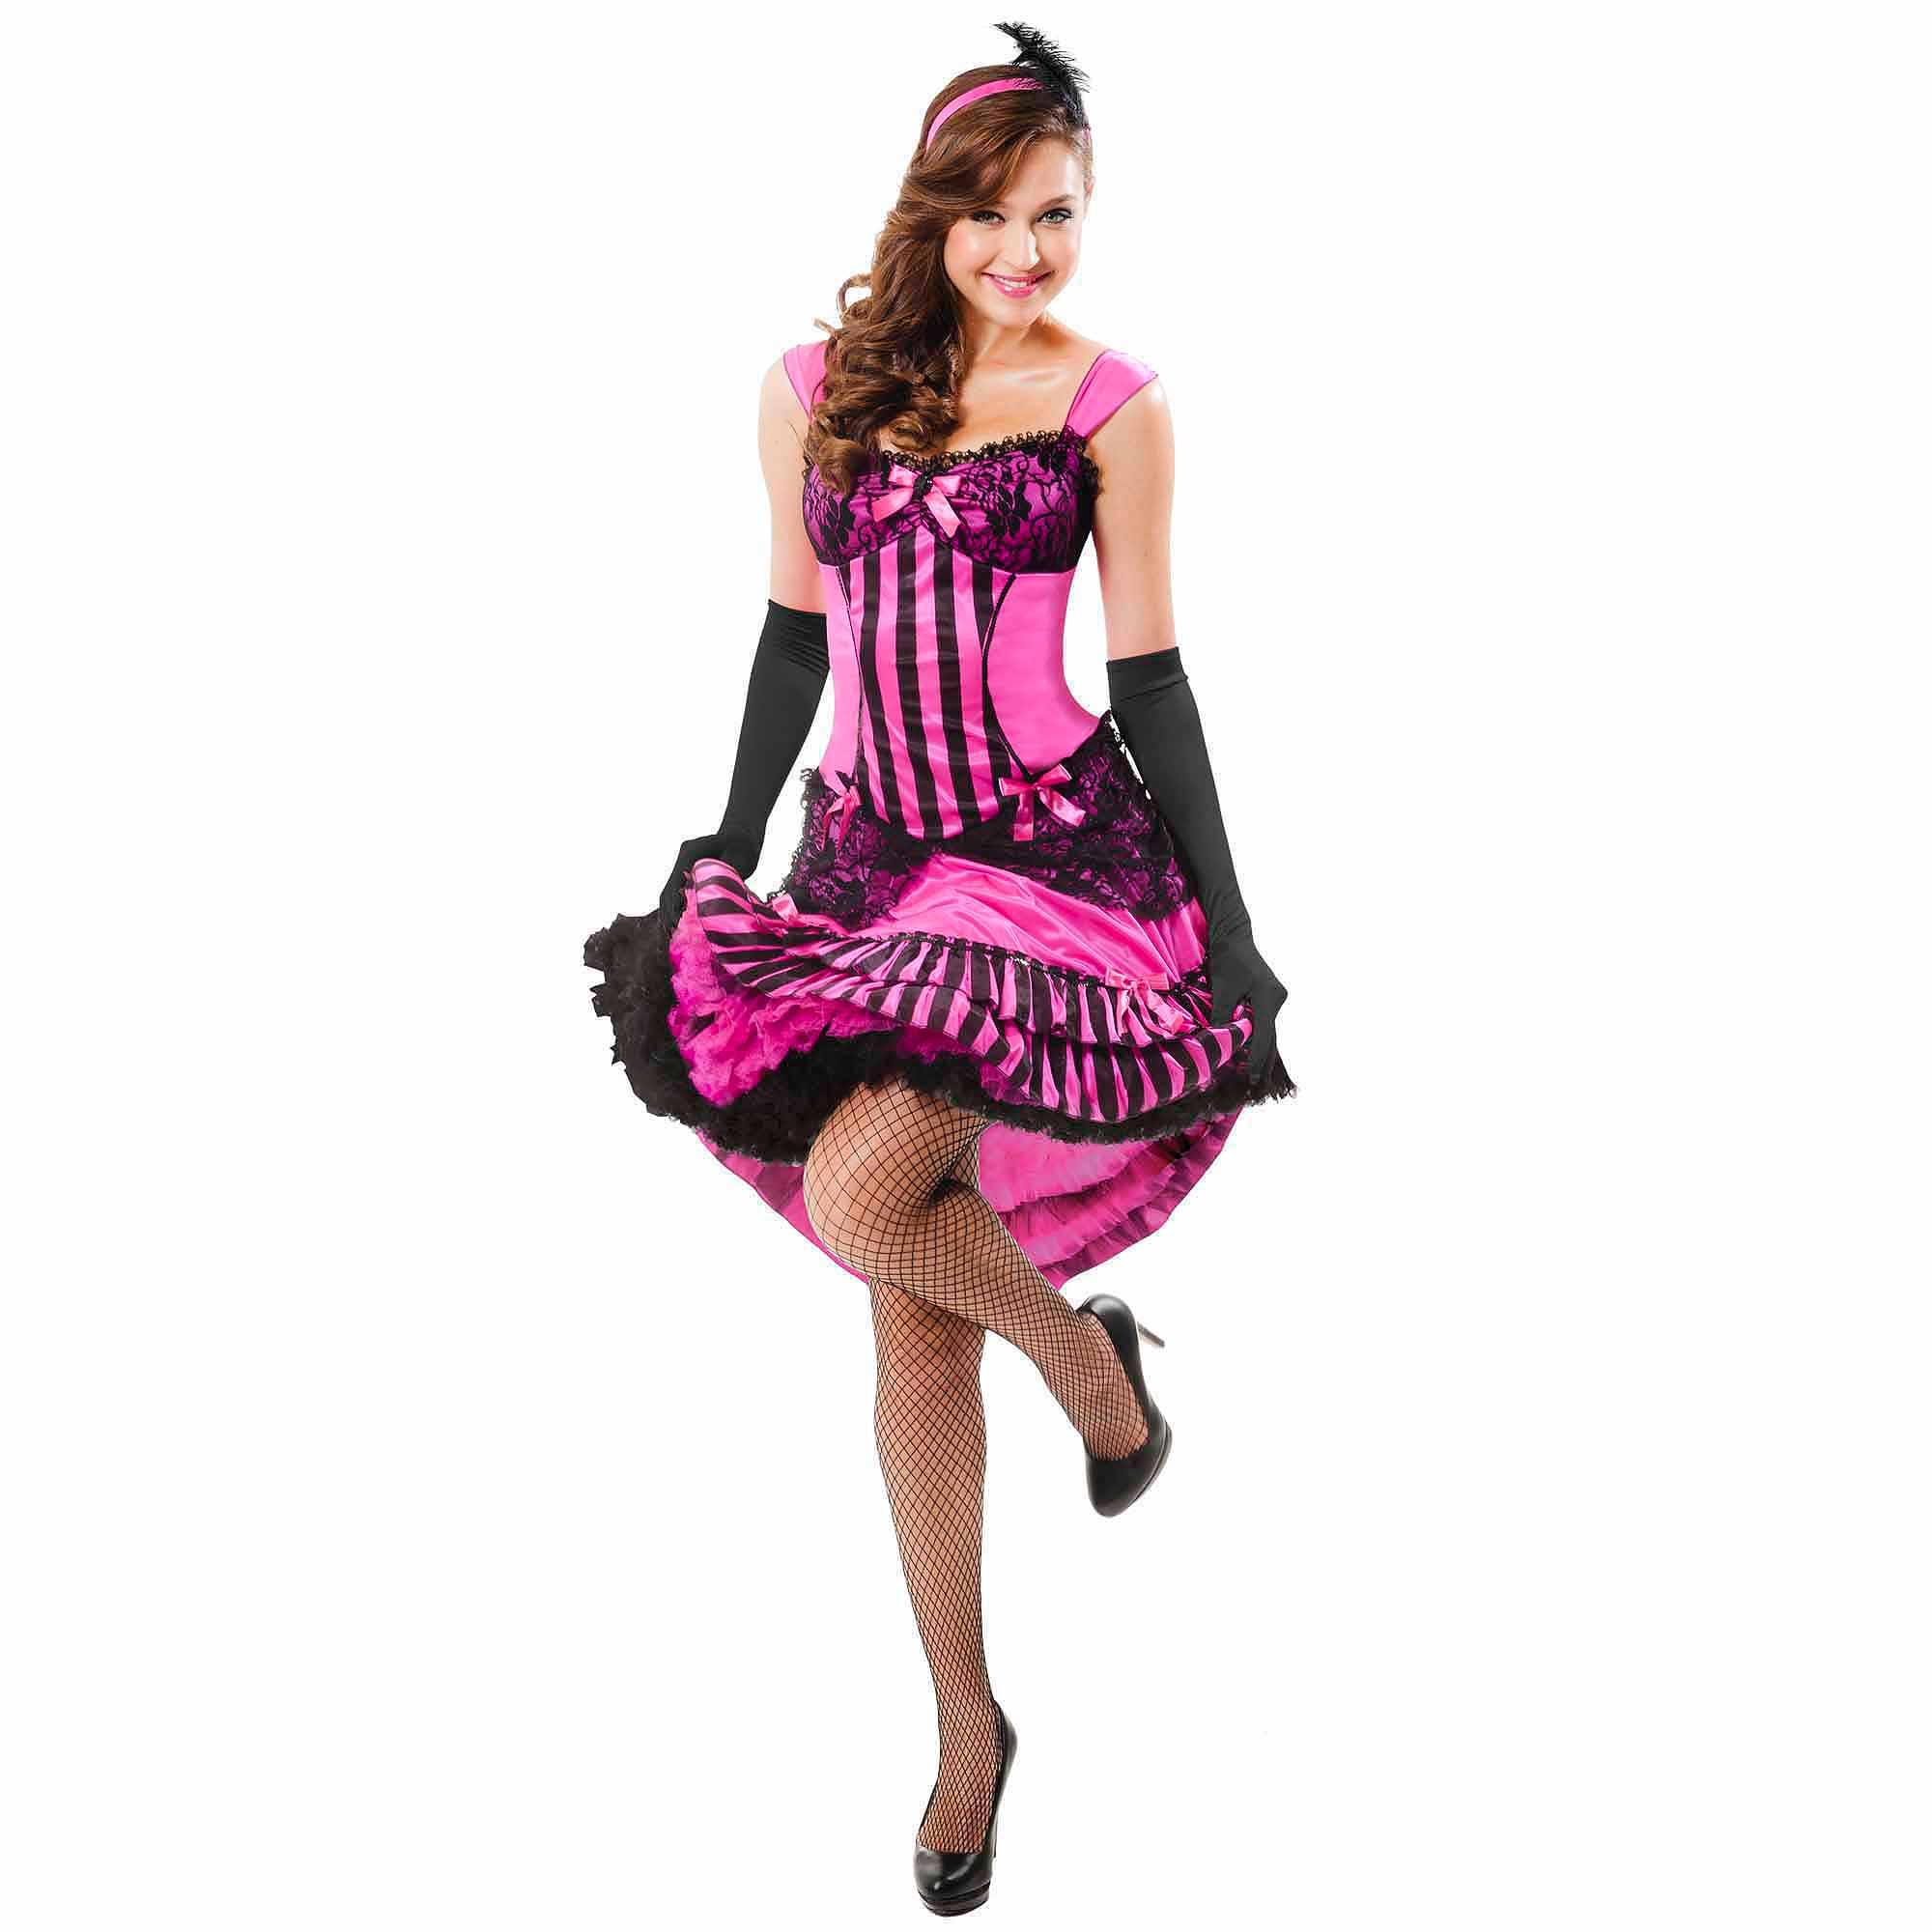 sc 1 st  Walmart & Saloon Girl Adult Halloween Costume - Walmart.com